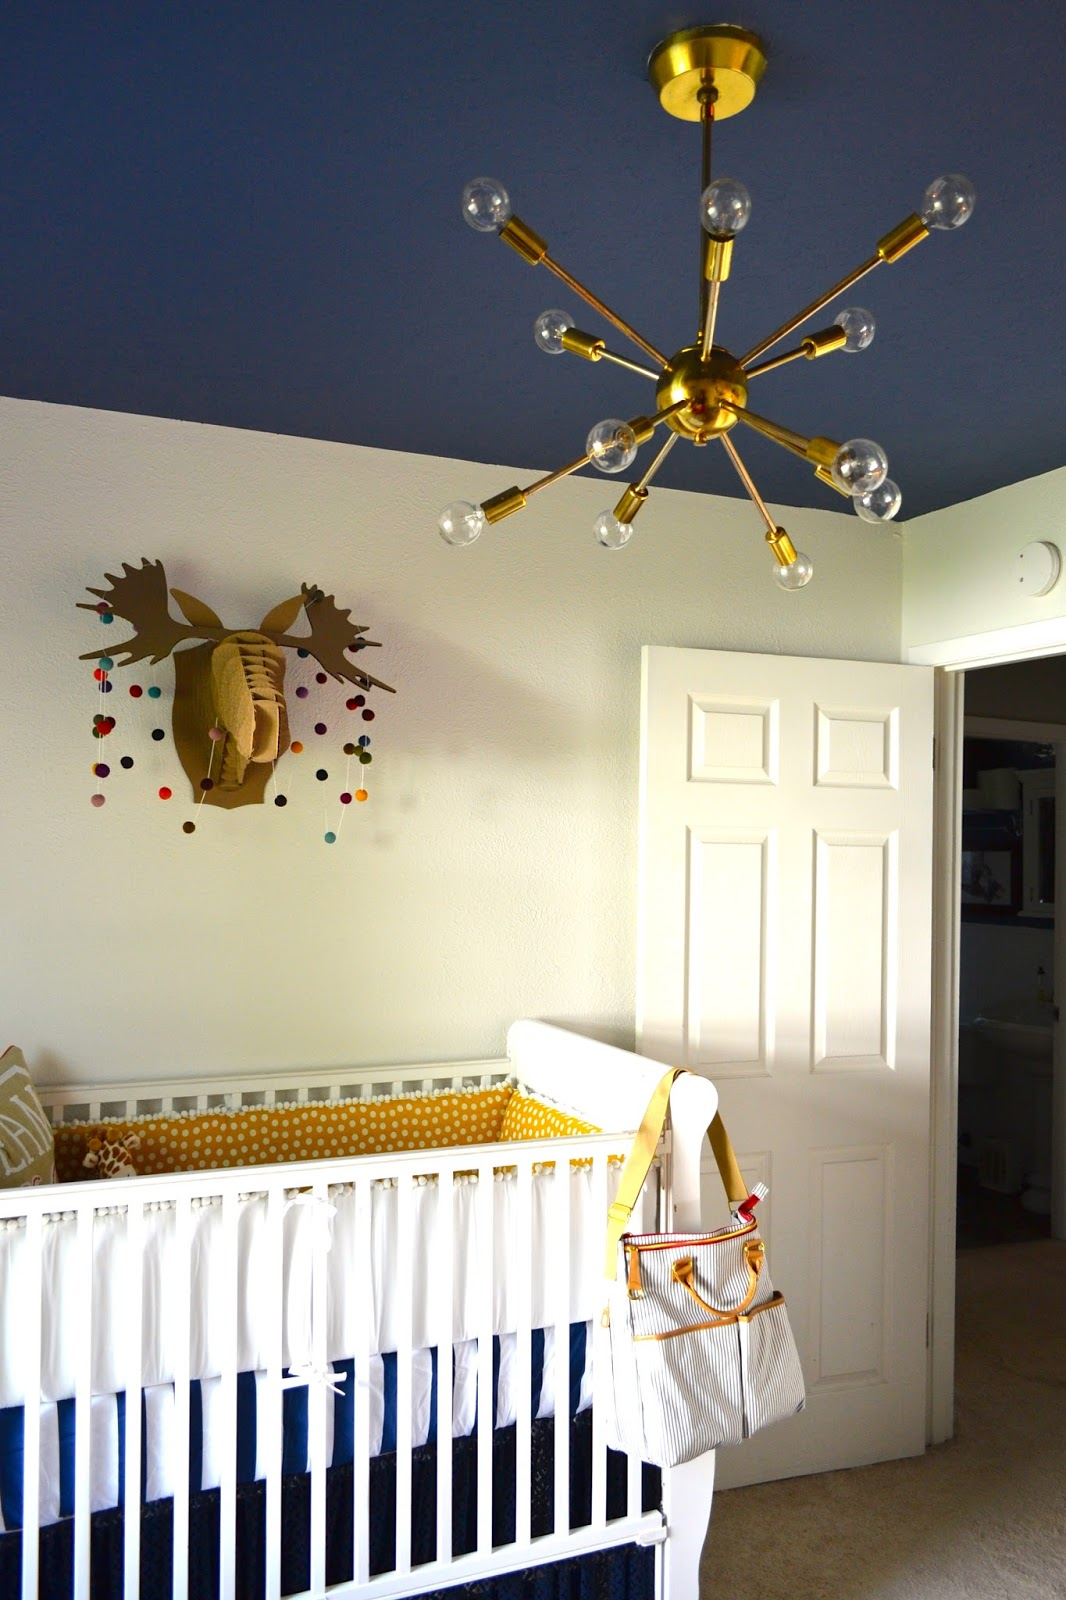 brit kids diy want chandelier s hang you children ll chandeliers room co to in ombre your buy